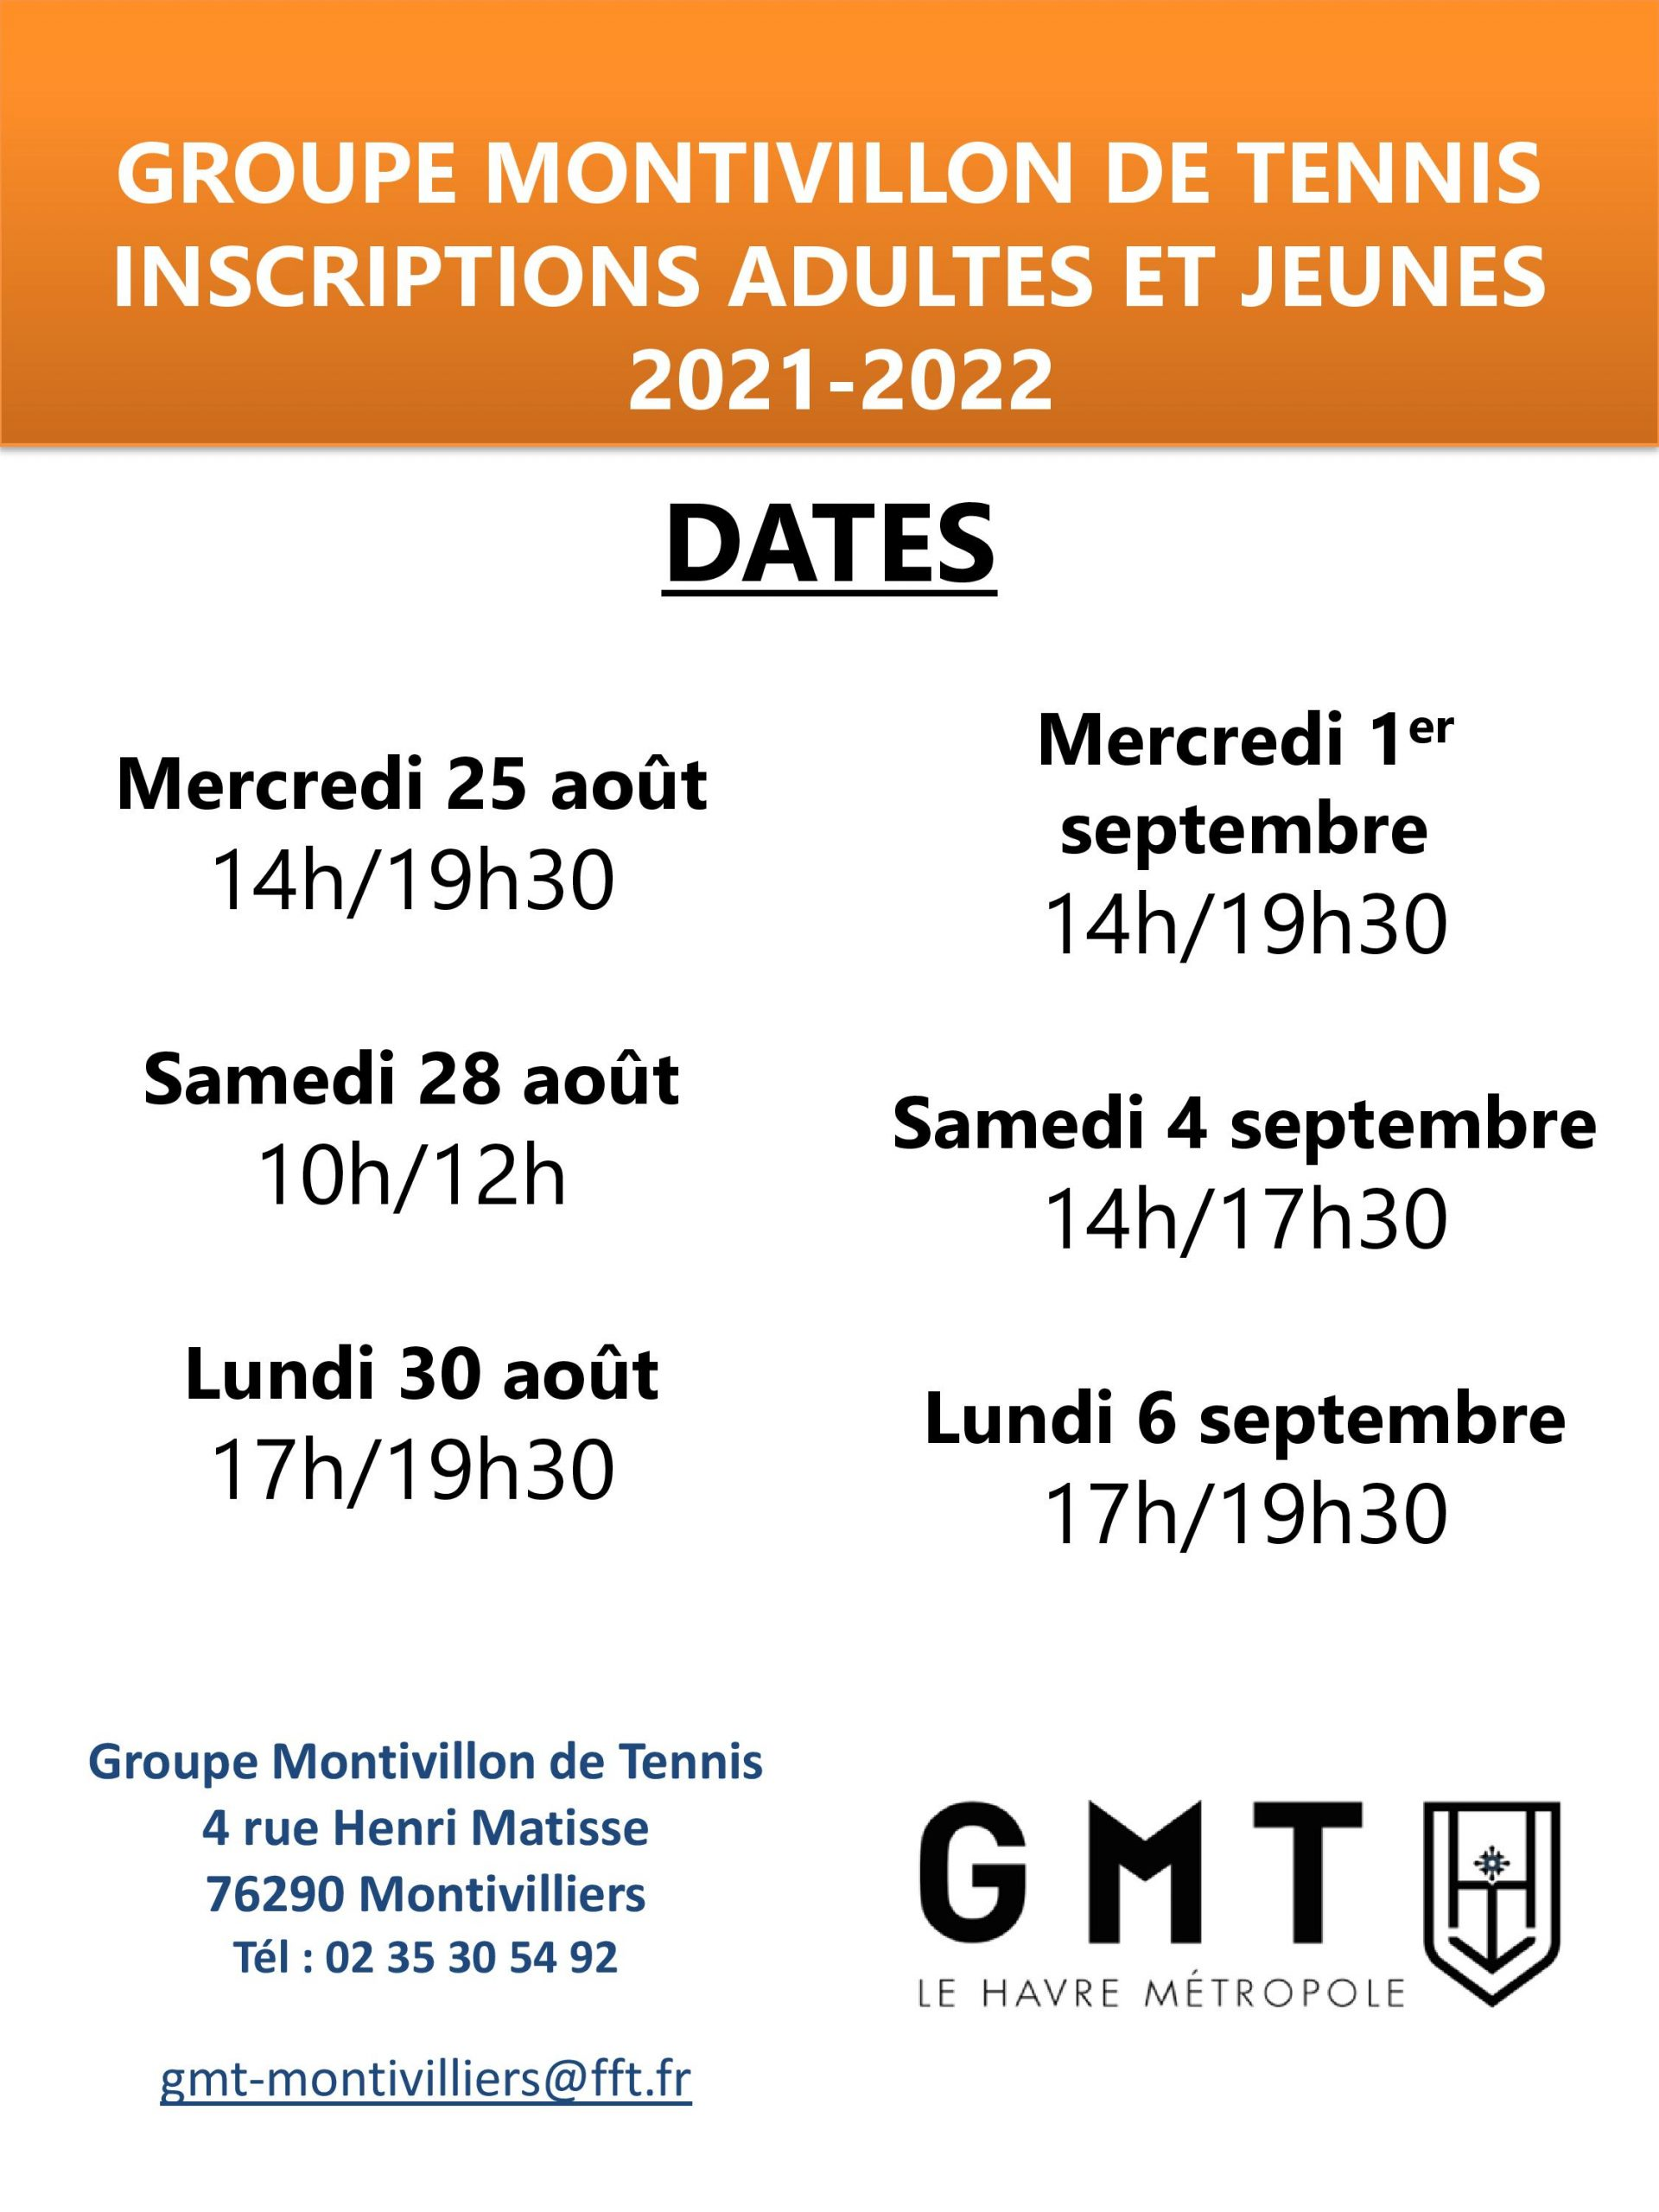 DATES INSCRIPTIONS 2021-2022